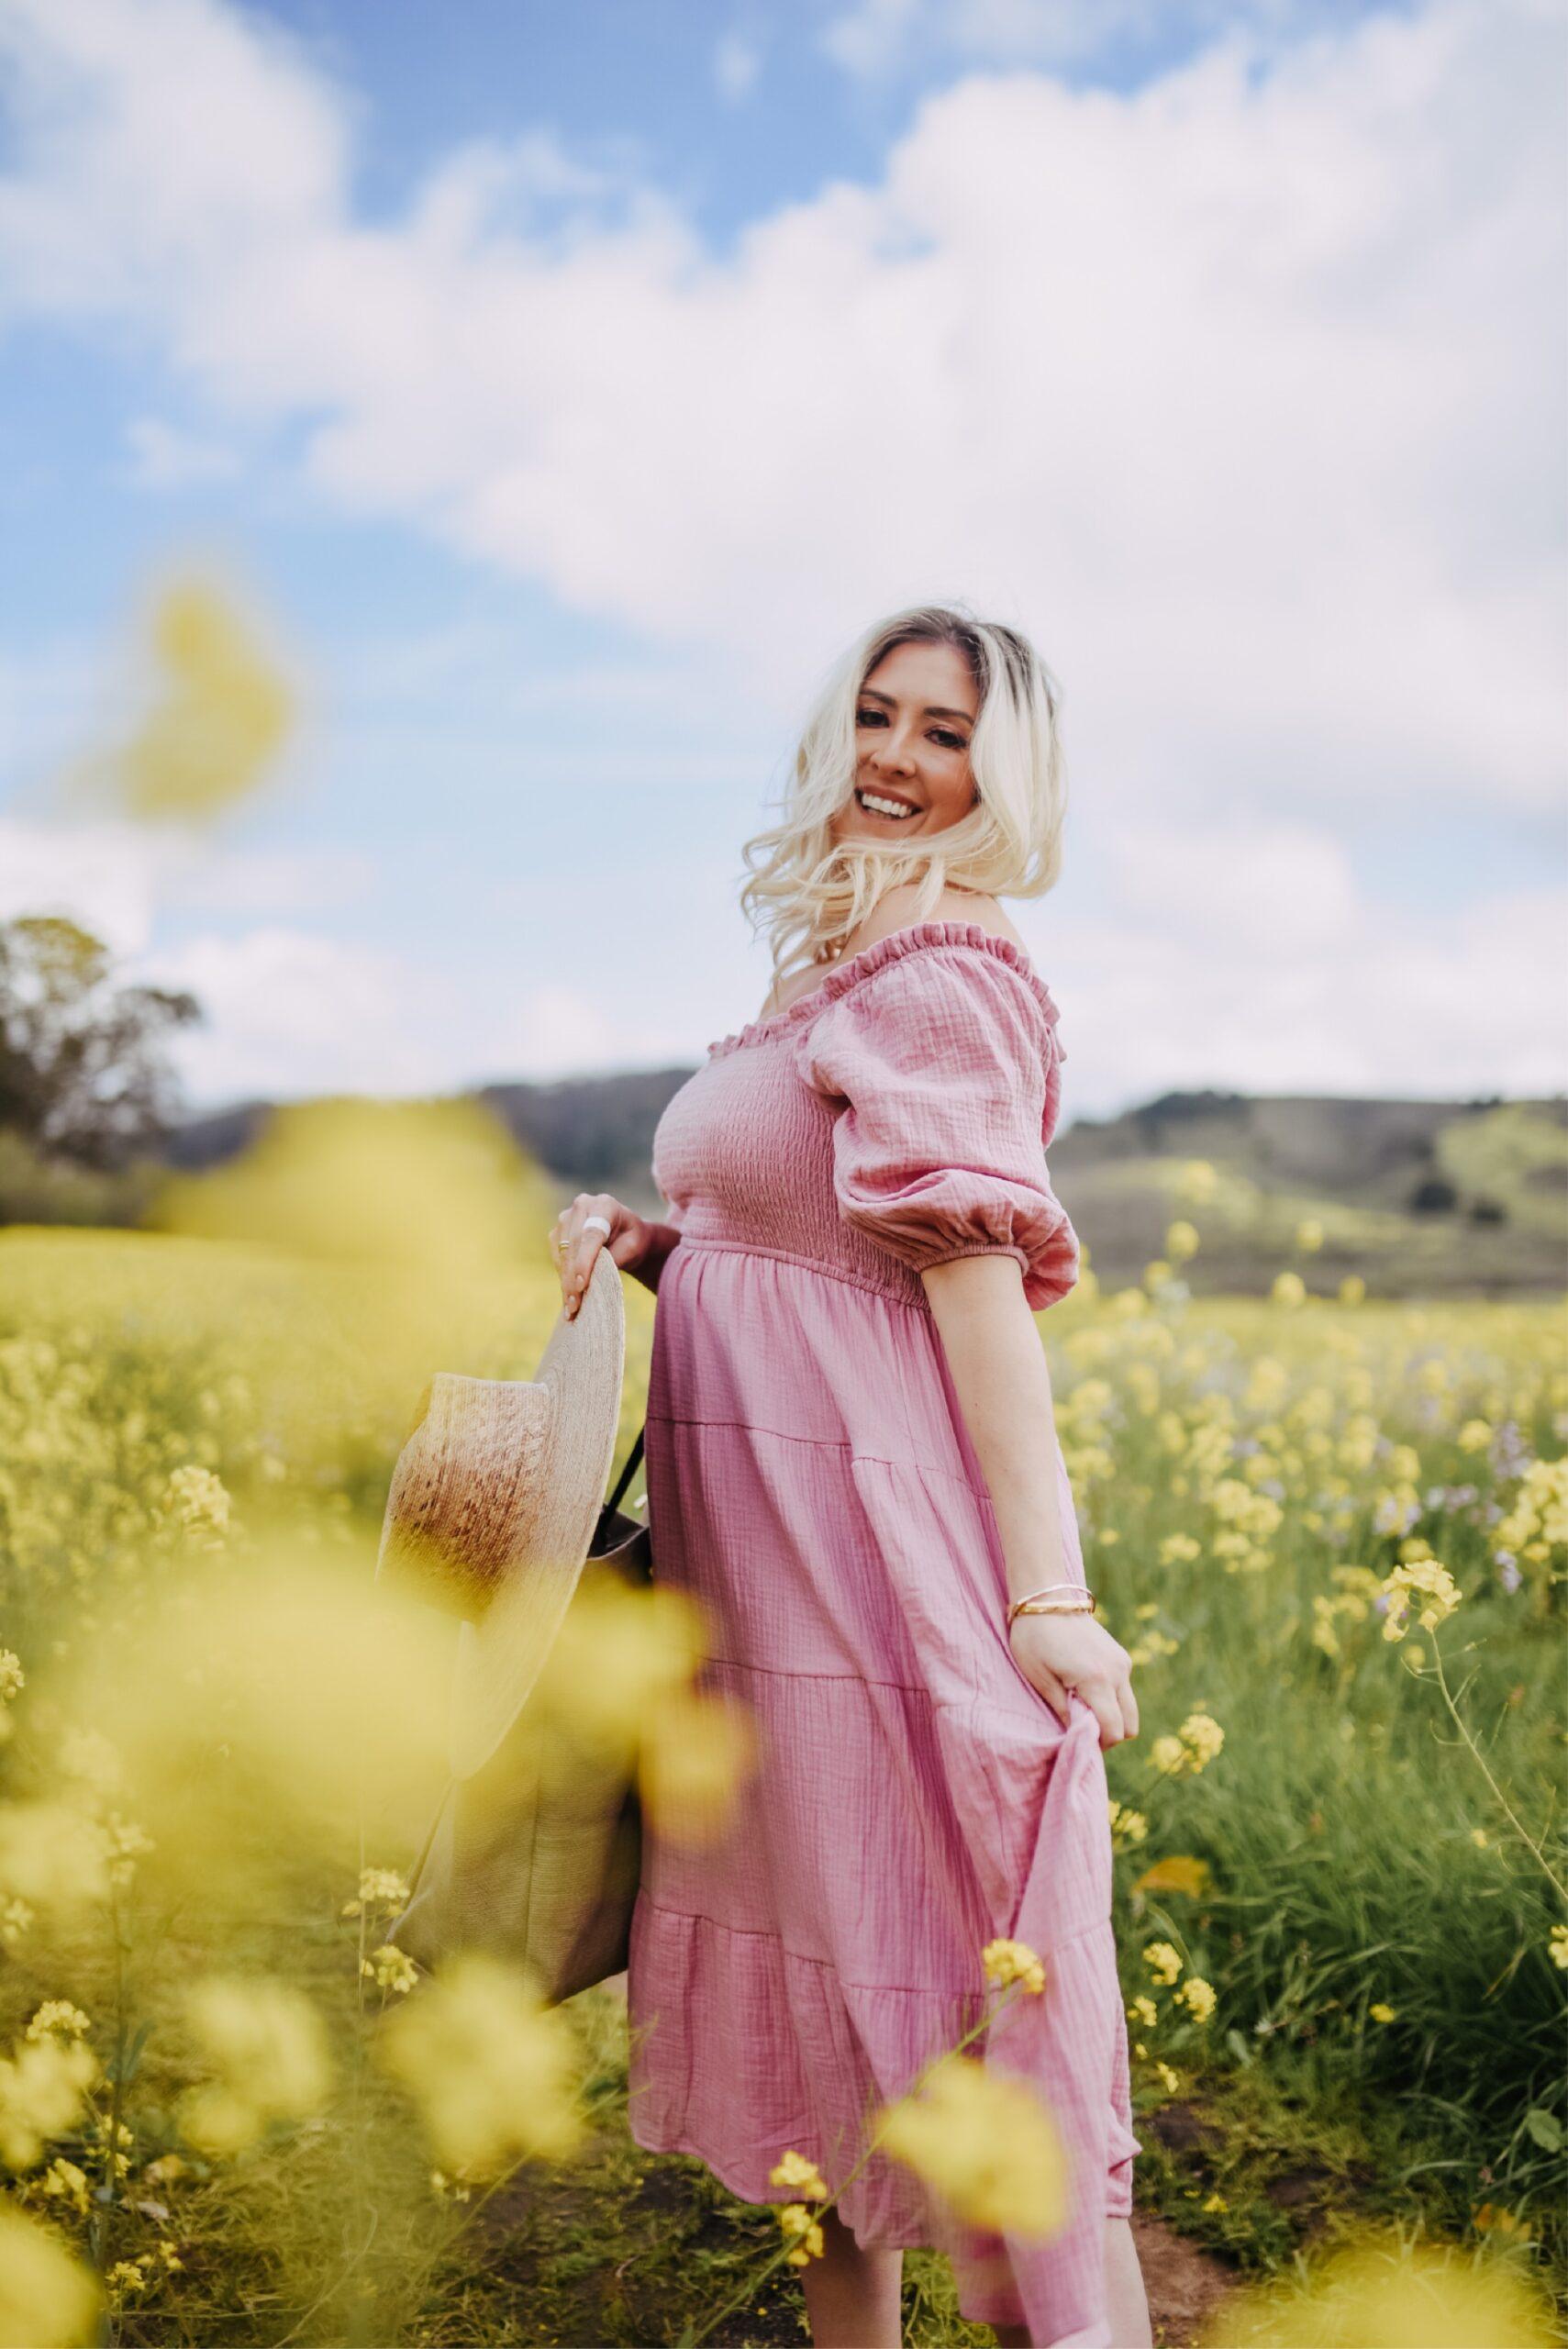 How to Find the Half Moon Bay Superbloom, Superbloom Directions, half moon bay mustard flower field, KatWalkSF wearing a nap dress